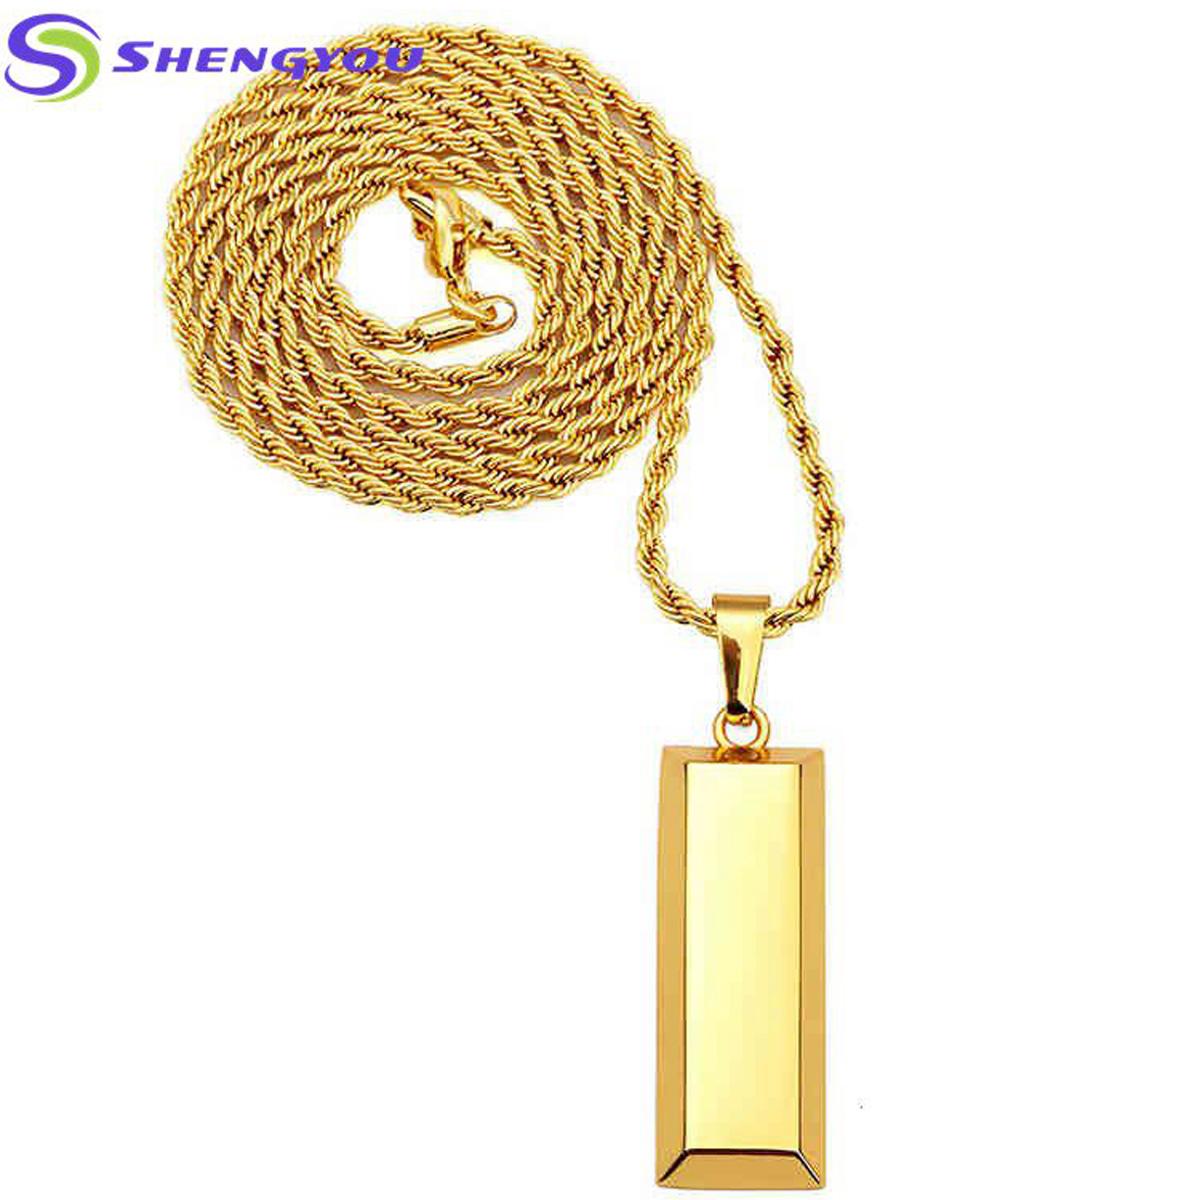 Elegant fashionable jewelry high quality 18k solid gold twist chain elegant fashionable jewelry high quality 18k solid gold twist chain necklace with gold bar pendants hip aloadofball Image collections